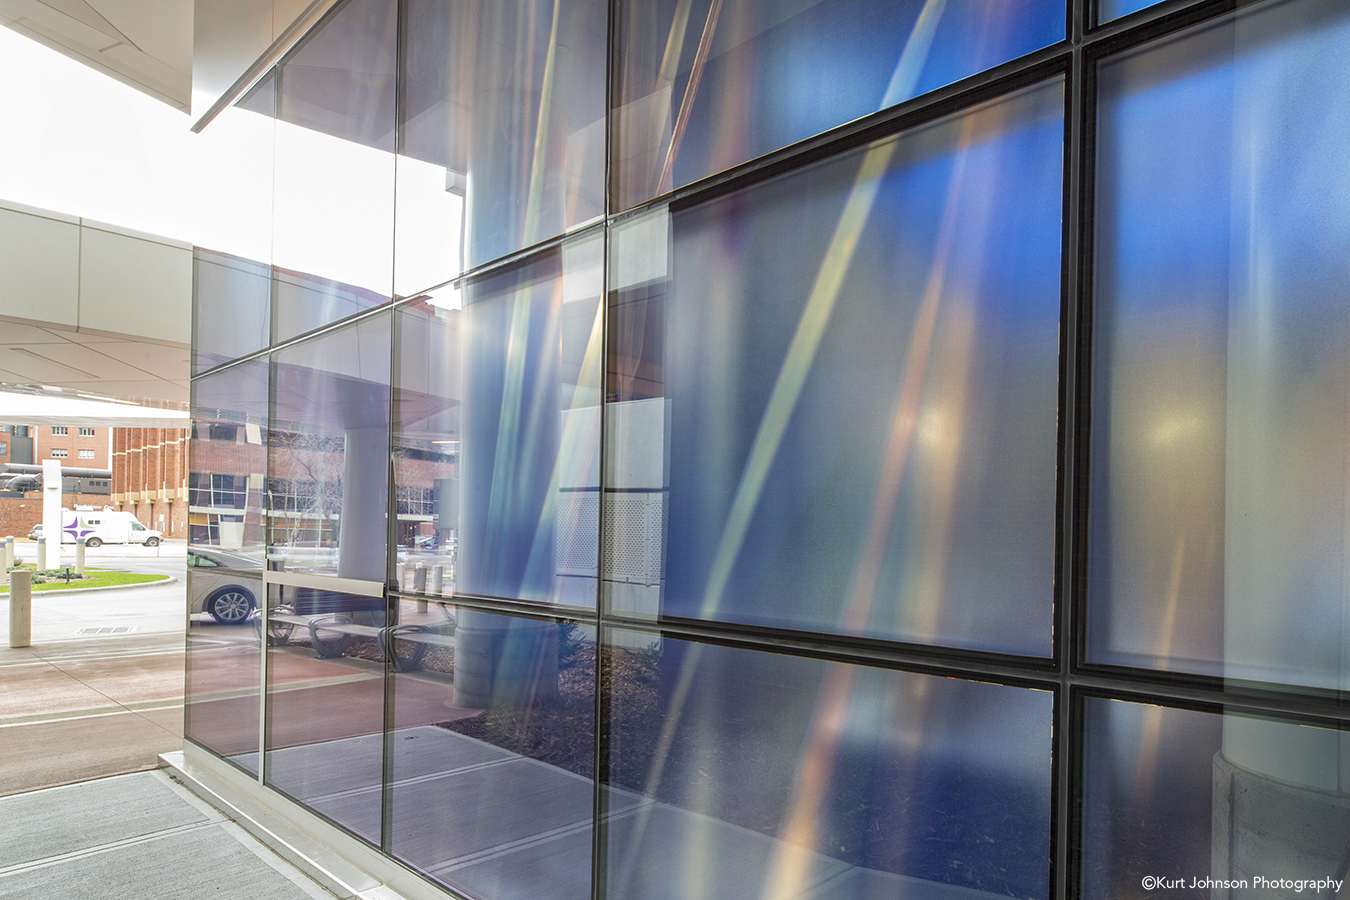 Install-film-glass-art-Midwest Fetal Care Clinic-MN-HDR Minnesota